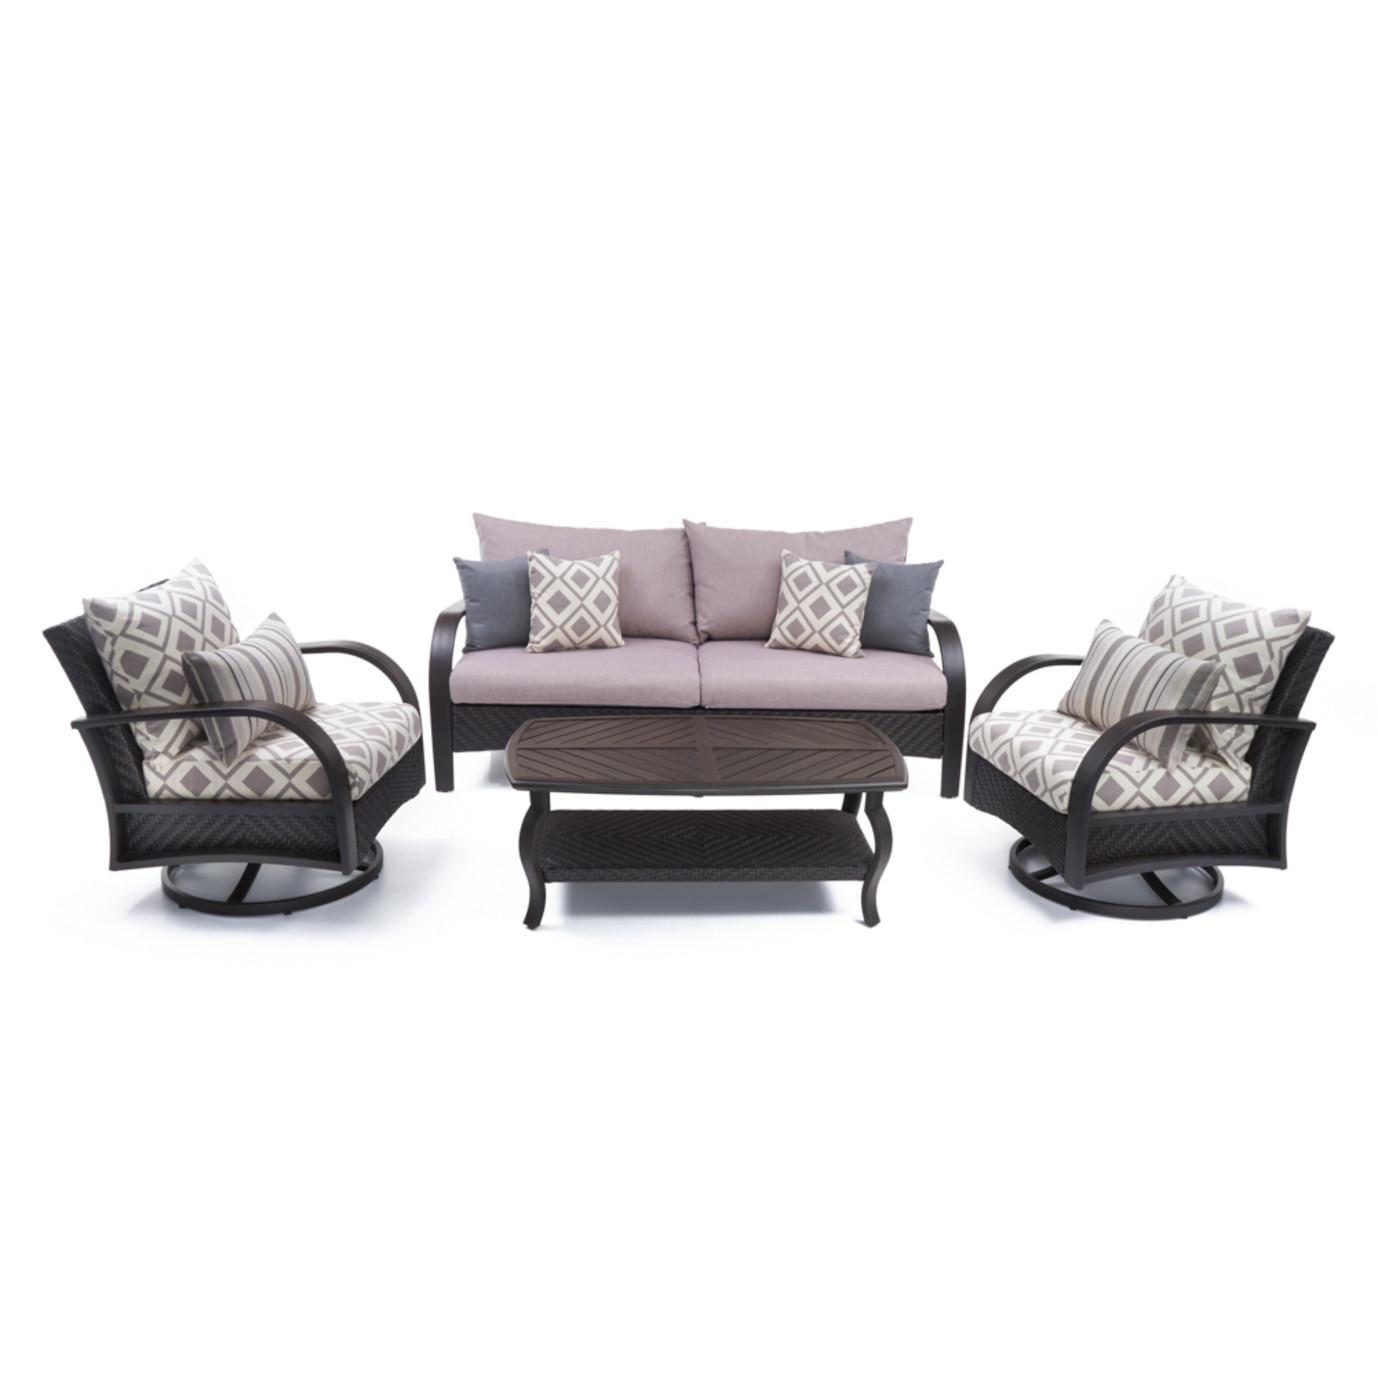 Barcelo™ 4pc Motion Club & Sofa Set - Wisteria Lavender